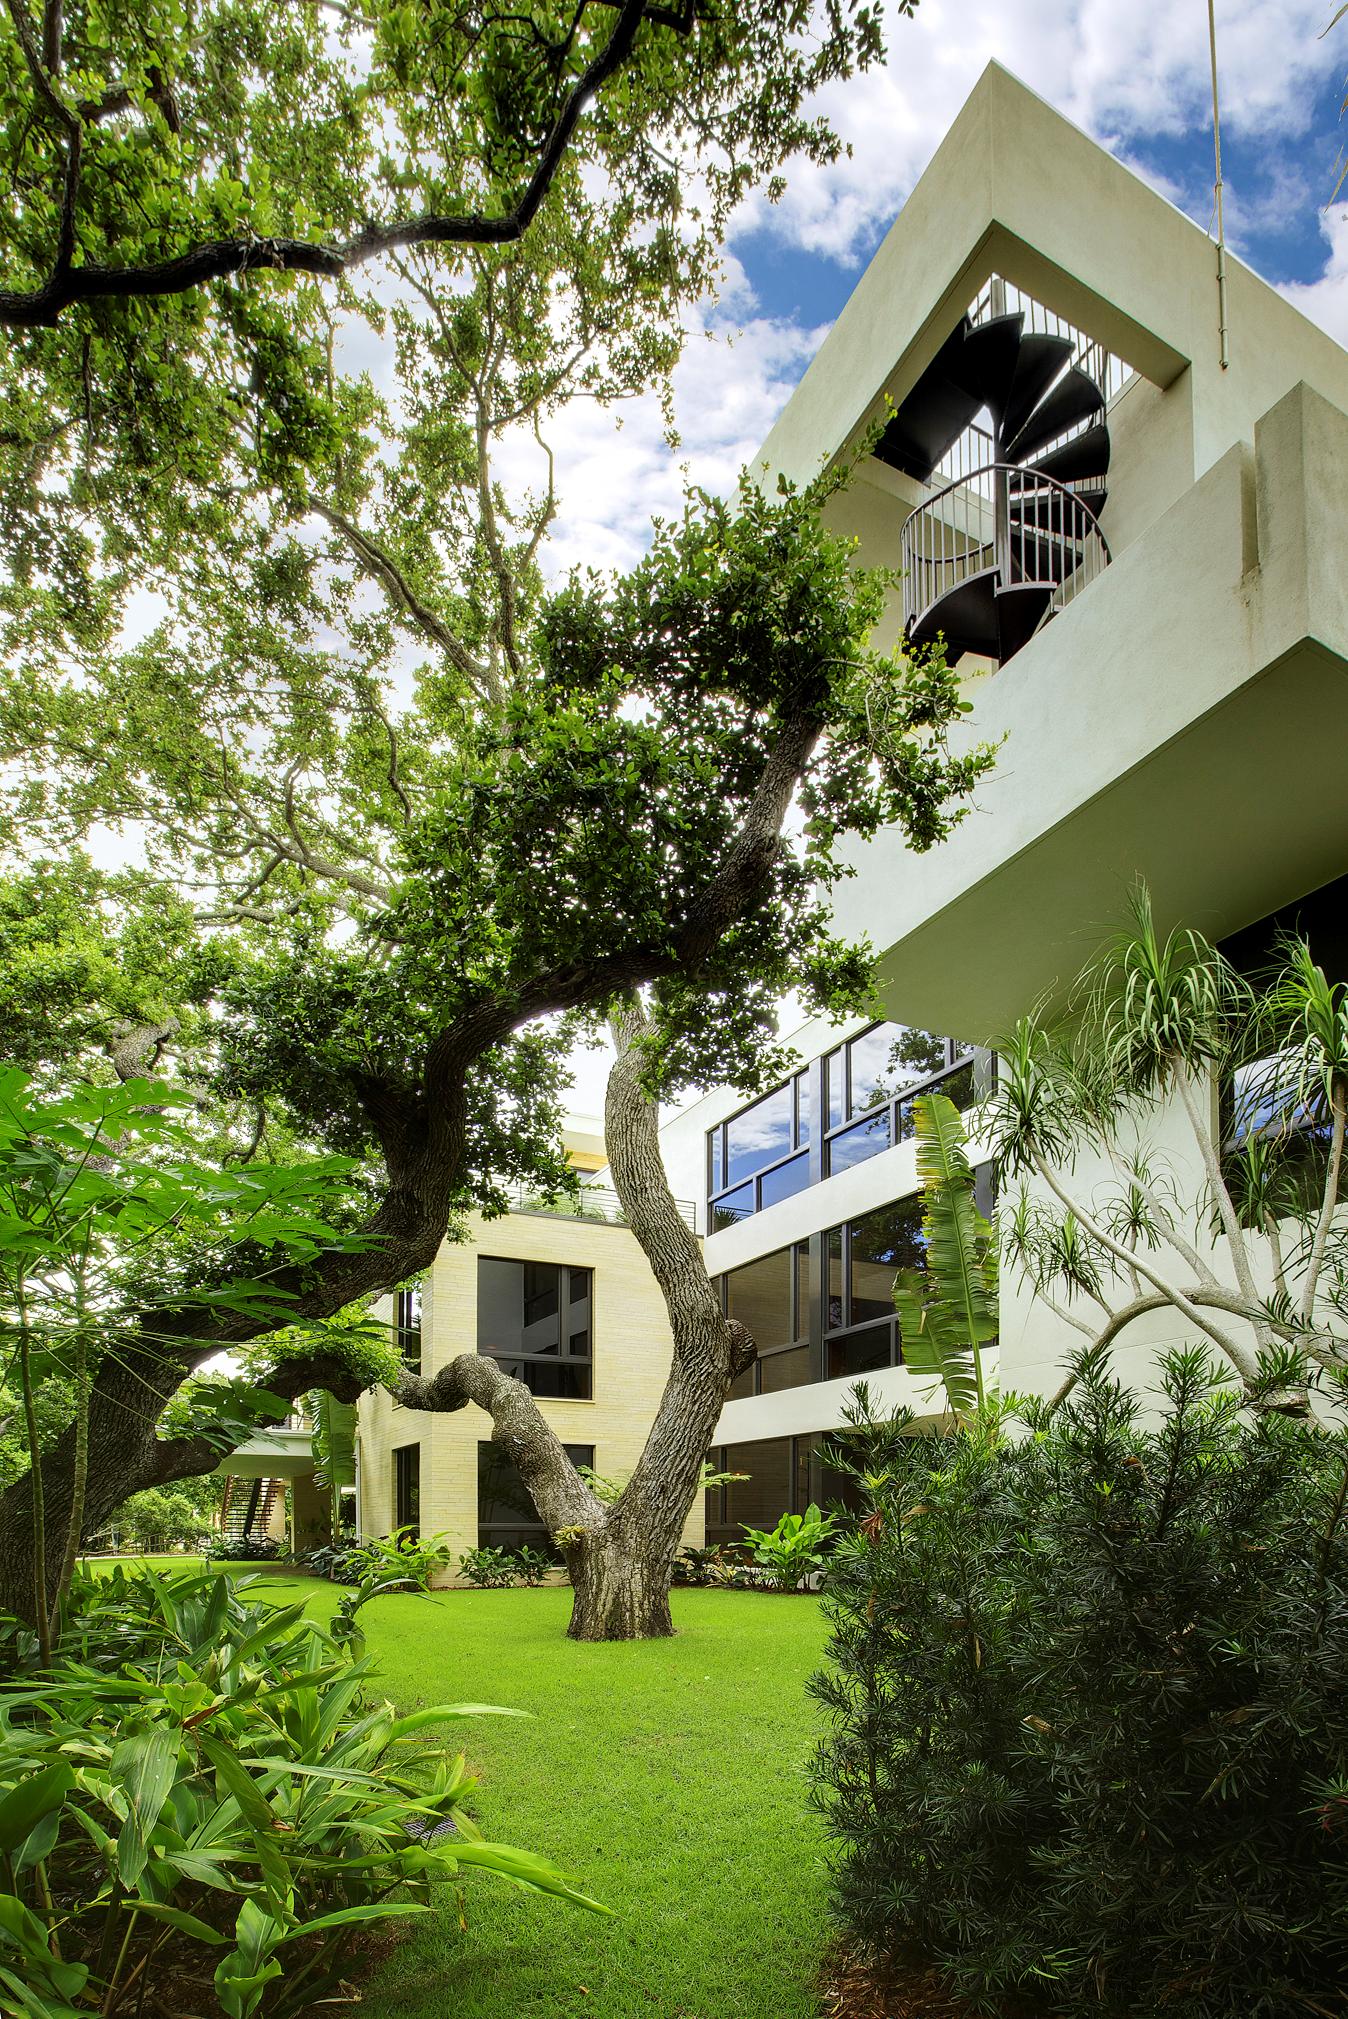 Rear elevation (1 of 2) of the winner of a 2010 BALA award for Custom Home 4000-6500 sq.ft.  Architect: Totems Architecture.  Builder: Michael K. Walker & Associates.  Interior Designer: Studio Hive. Photographer: Greg Wilson Photography.